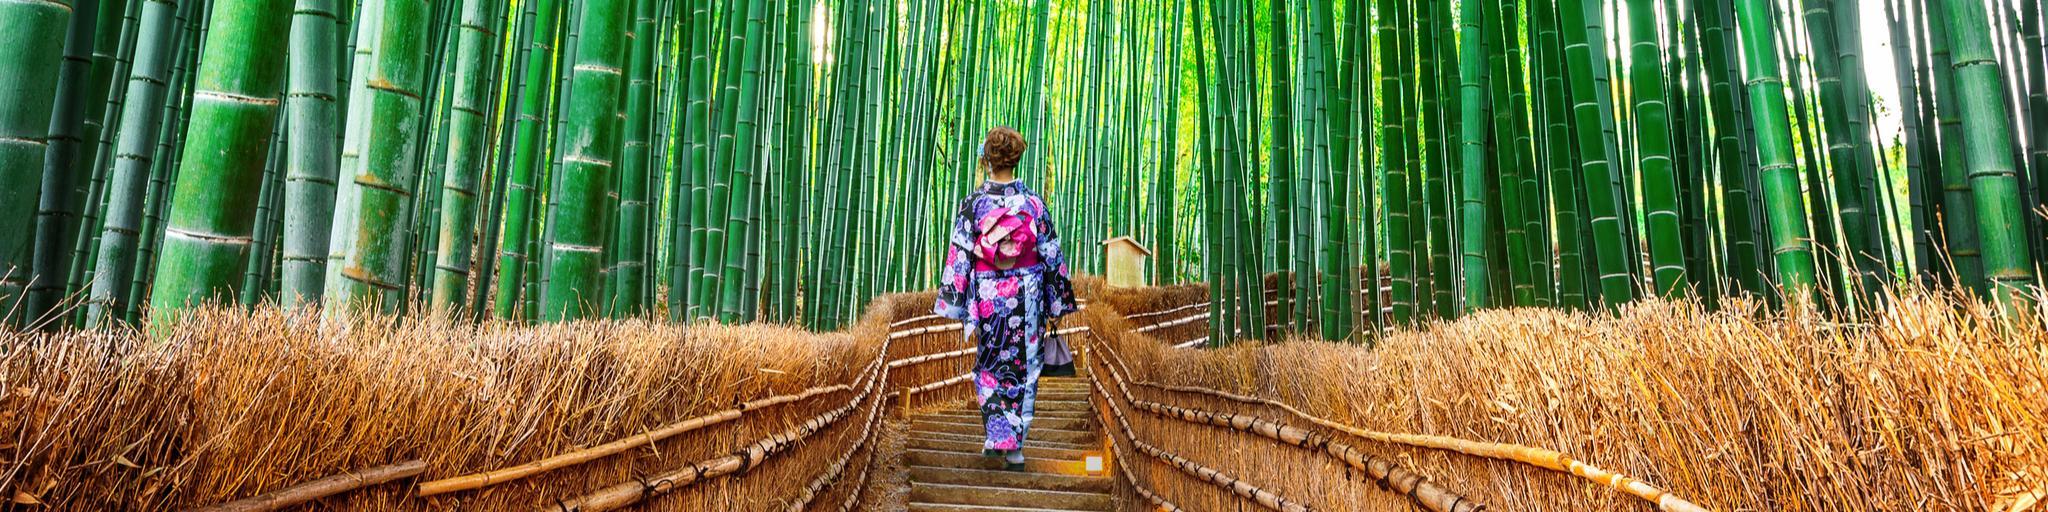 A woman dressed in a kimono walking through Arashiyama Bamboo Grove, Kyoto